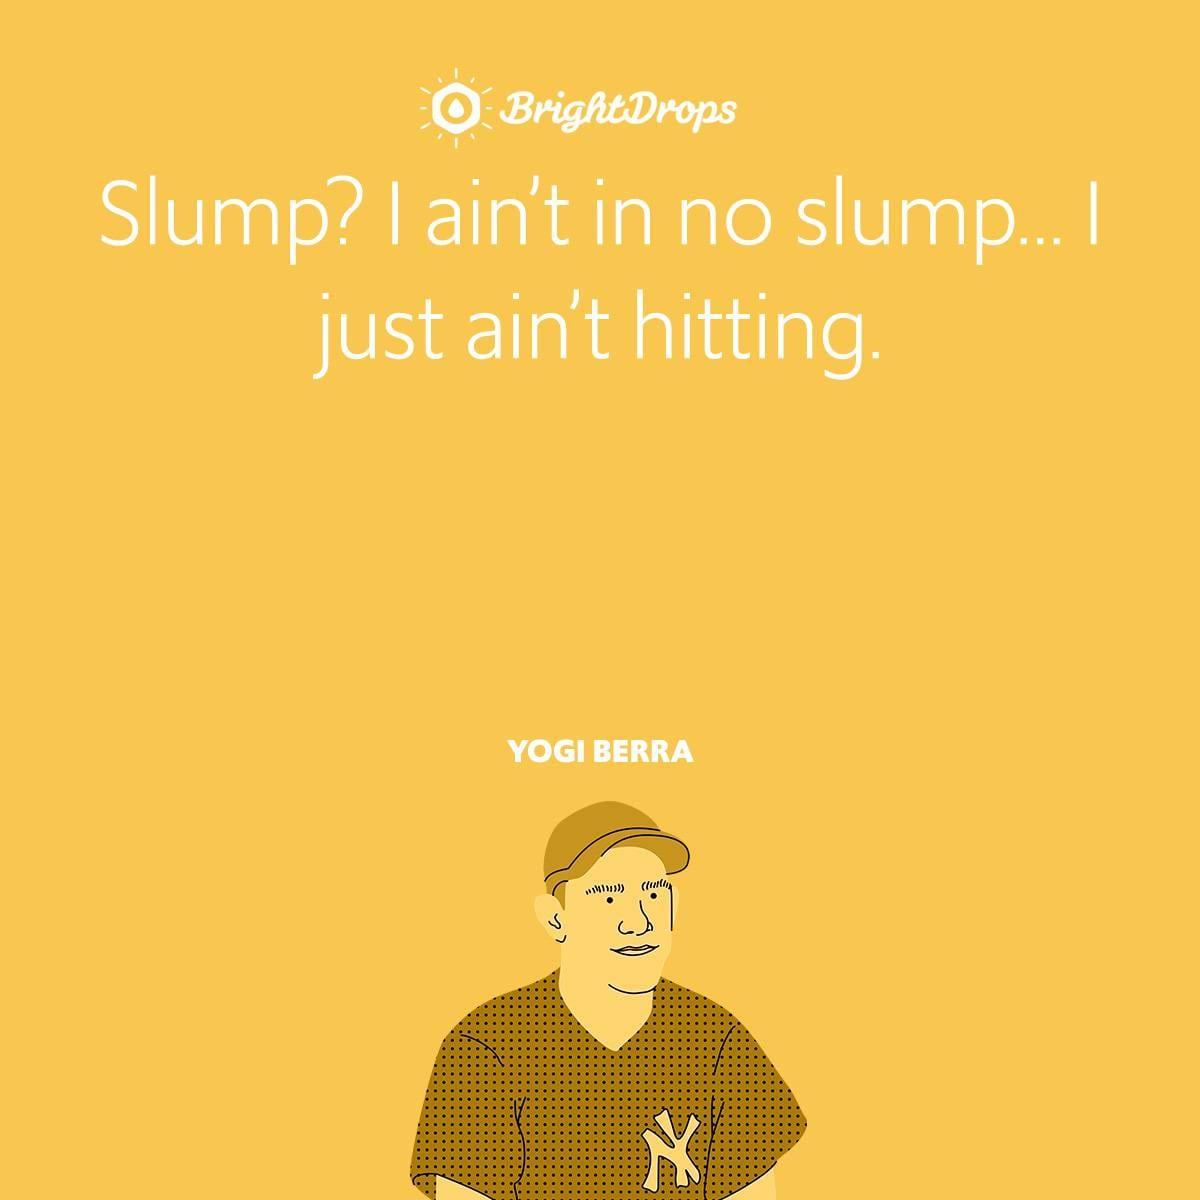 Slump? I ain't in no slump… I just ain't hitting.